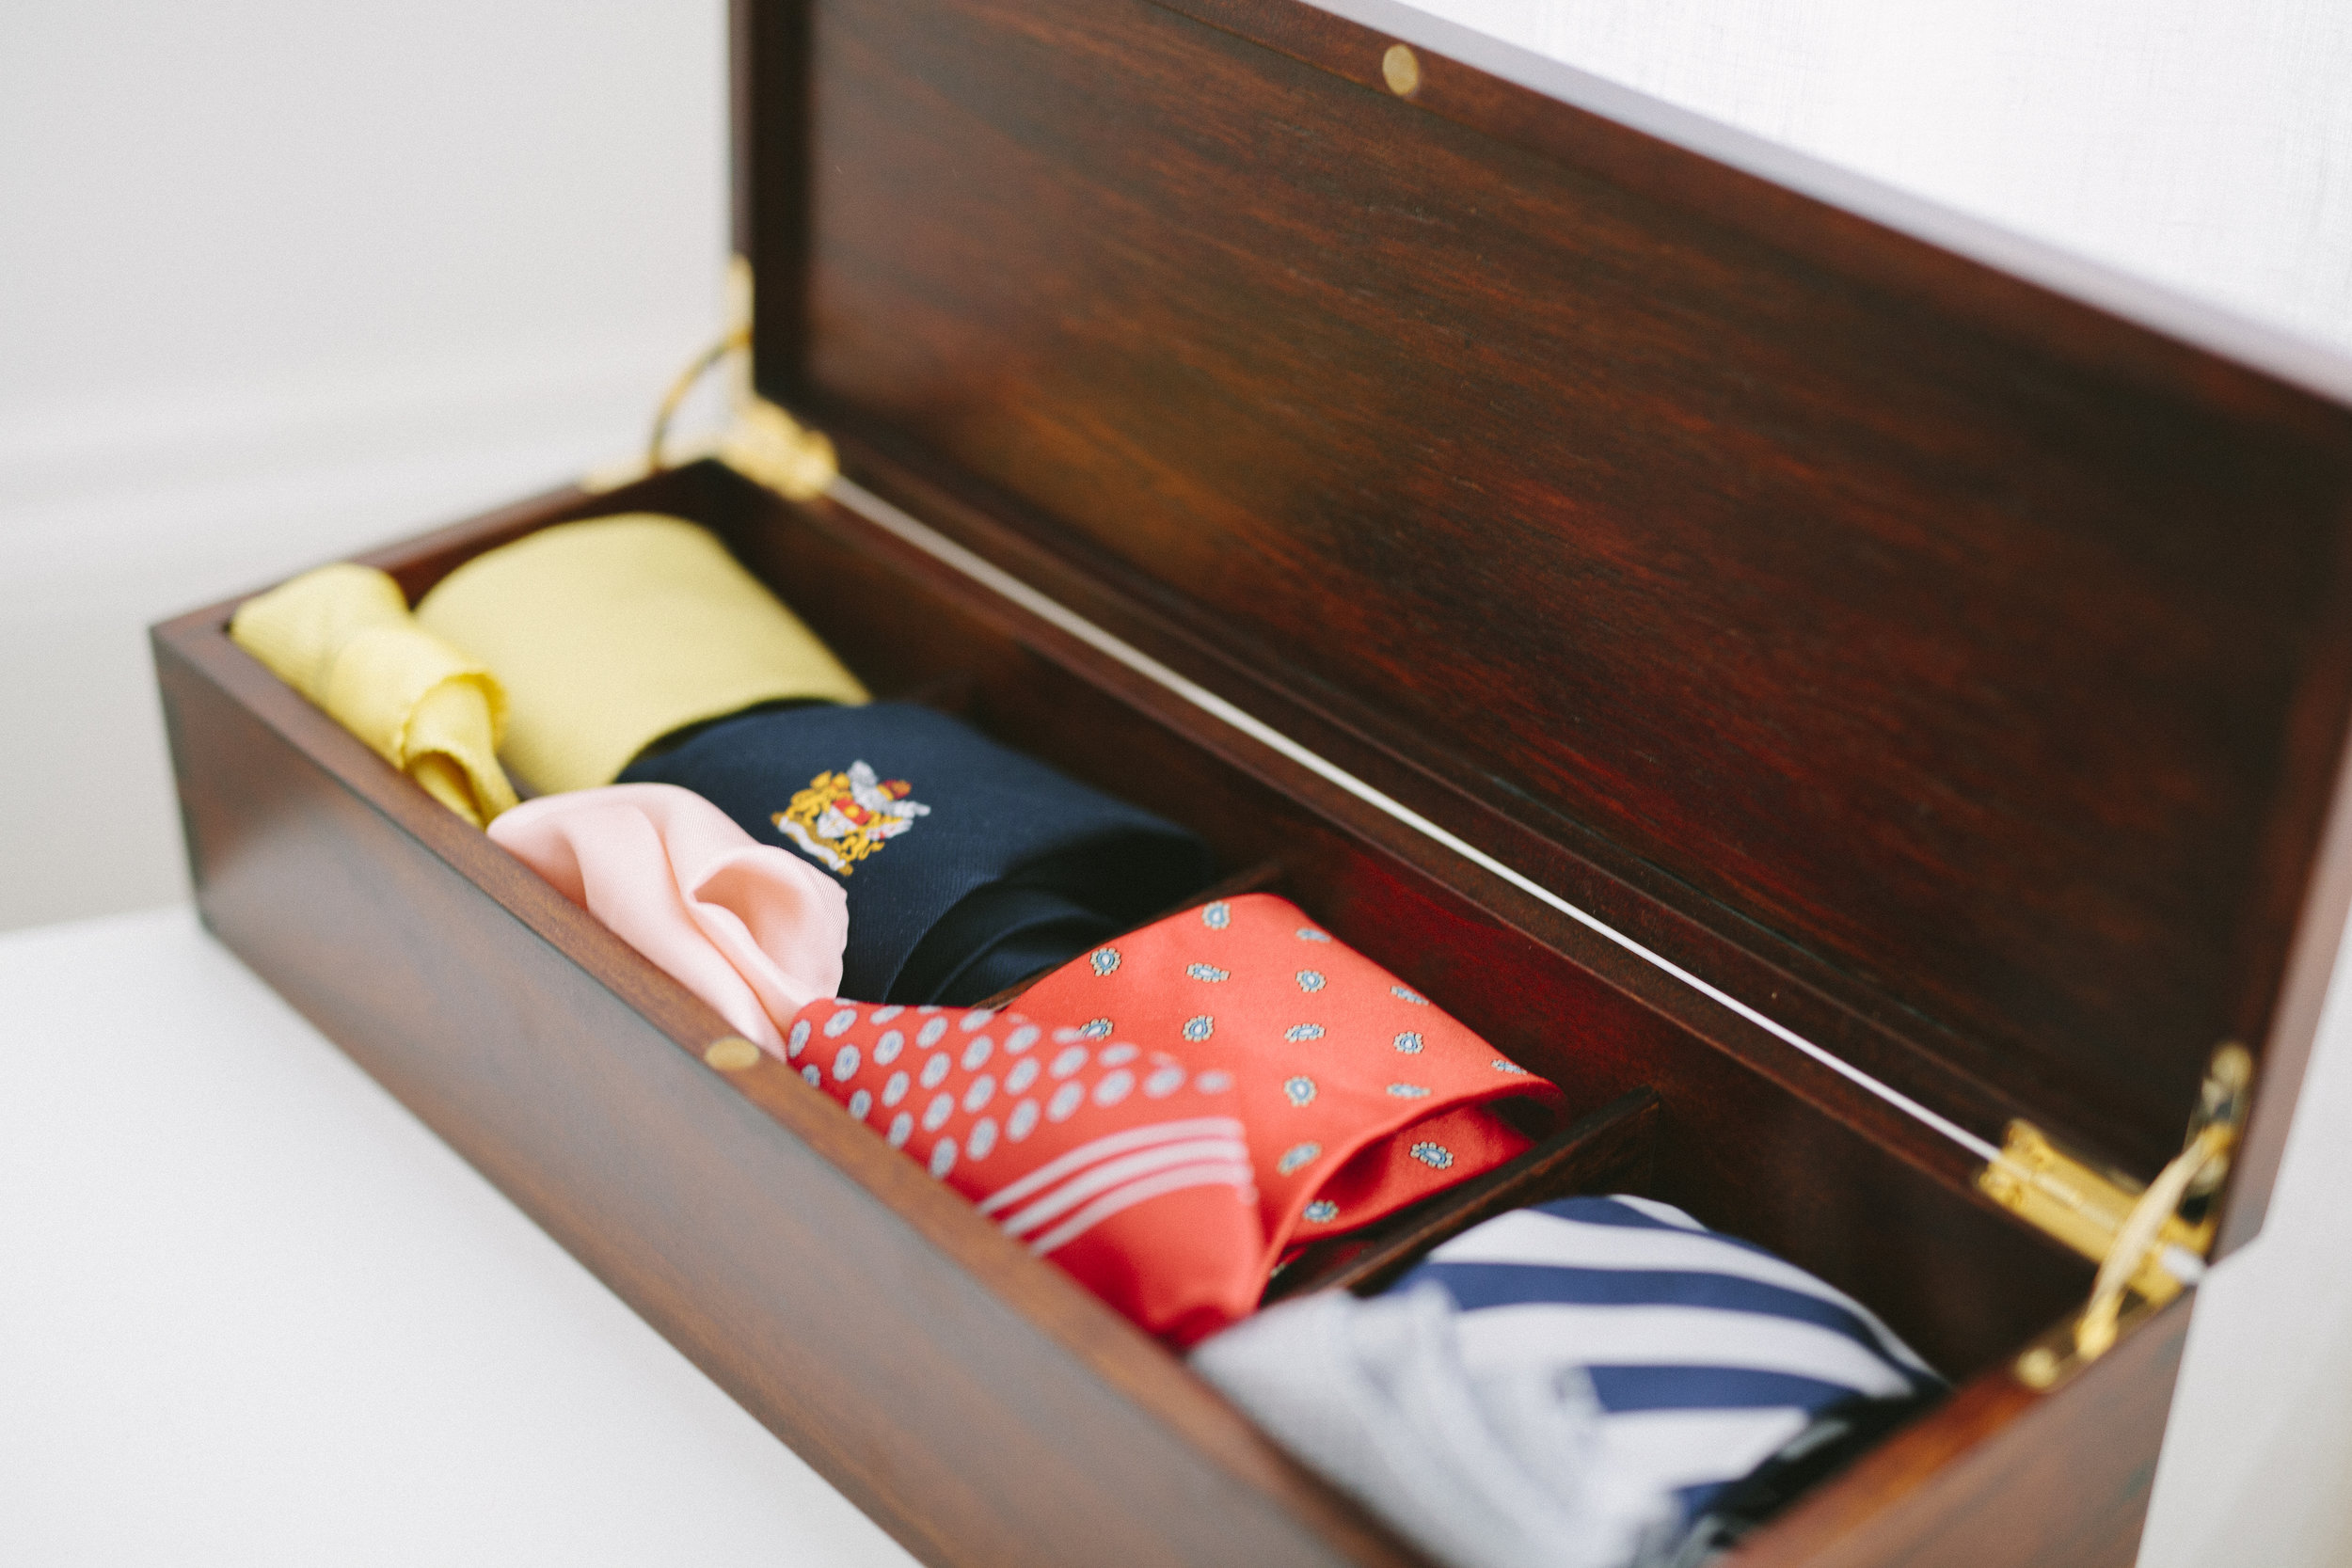 Les Cravate